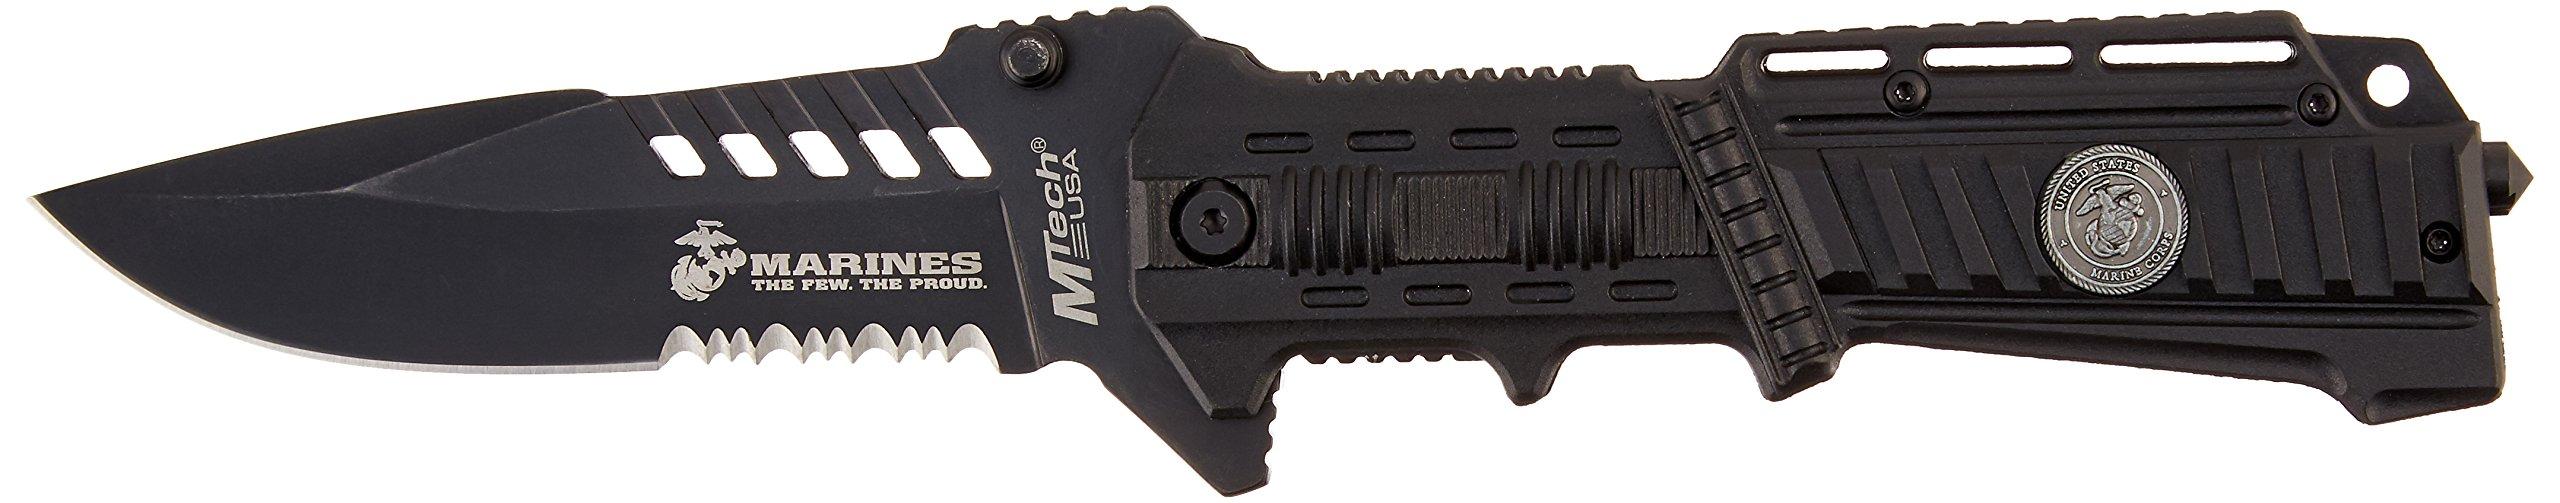 MTECH USA M-1000B US Marines Plastic Handle Folding Knife, 5-Inch Closed Length